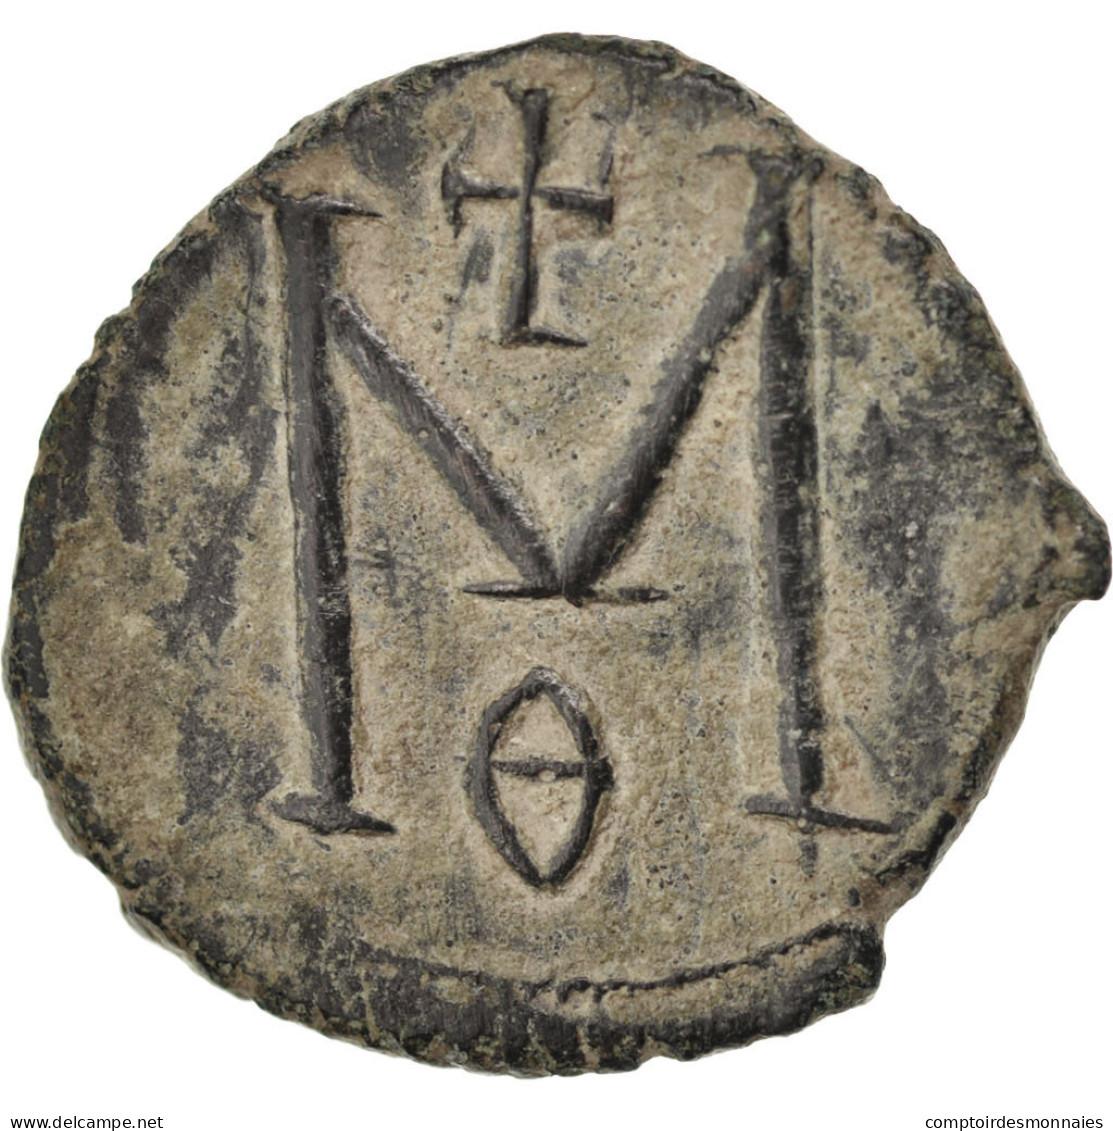 [#45559] Michel II Et Théophile, 40 Nummi (Follis), Syracuse, Sear 1652 - Byzantines